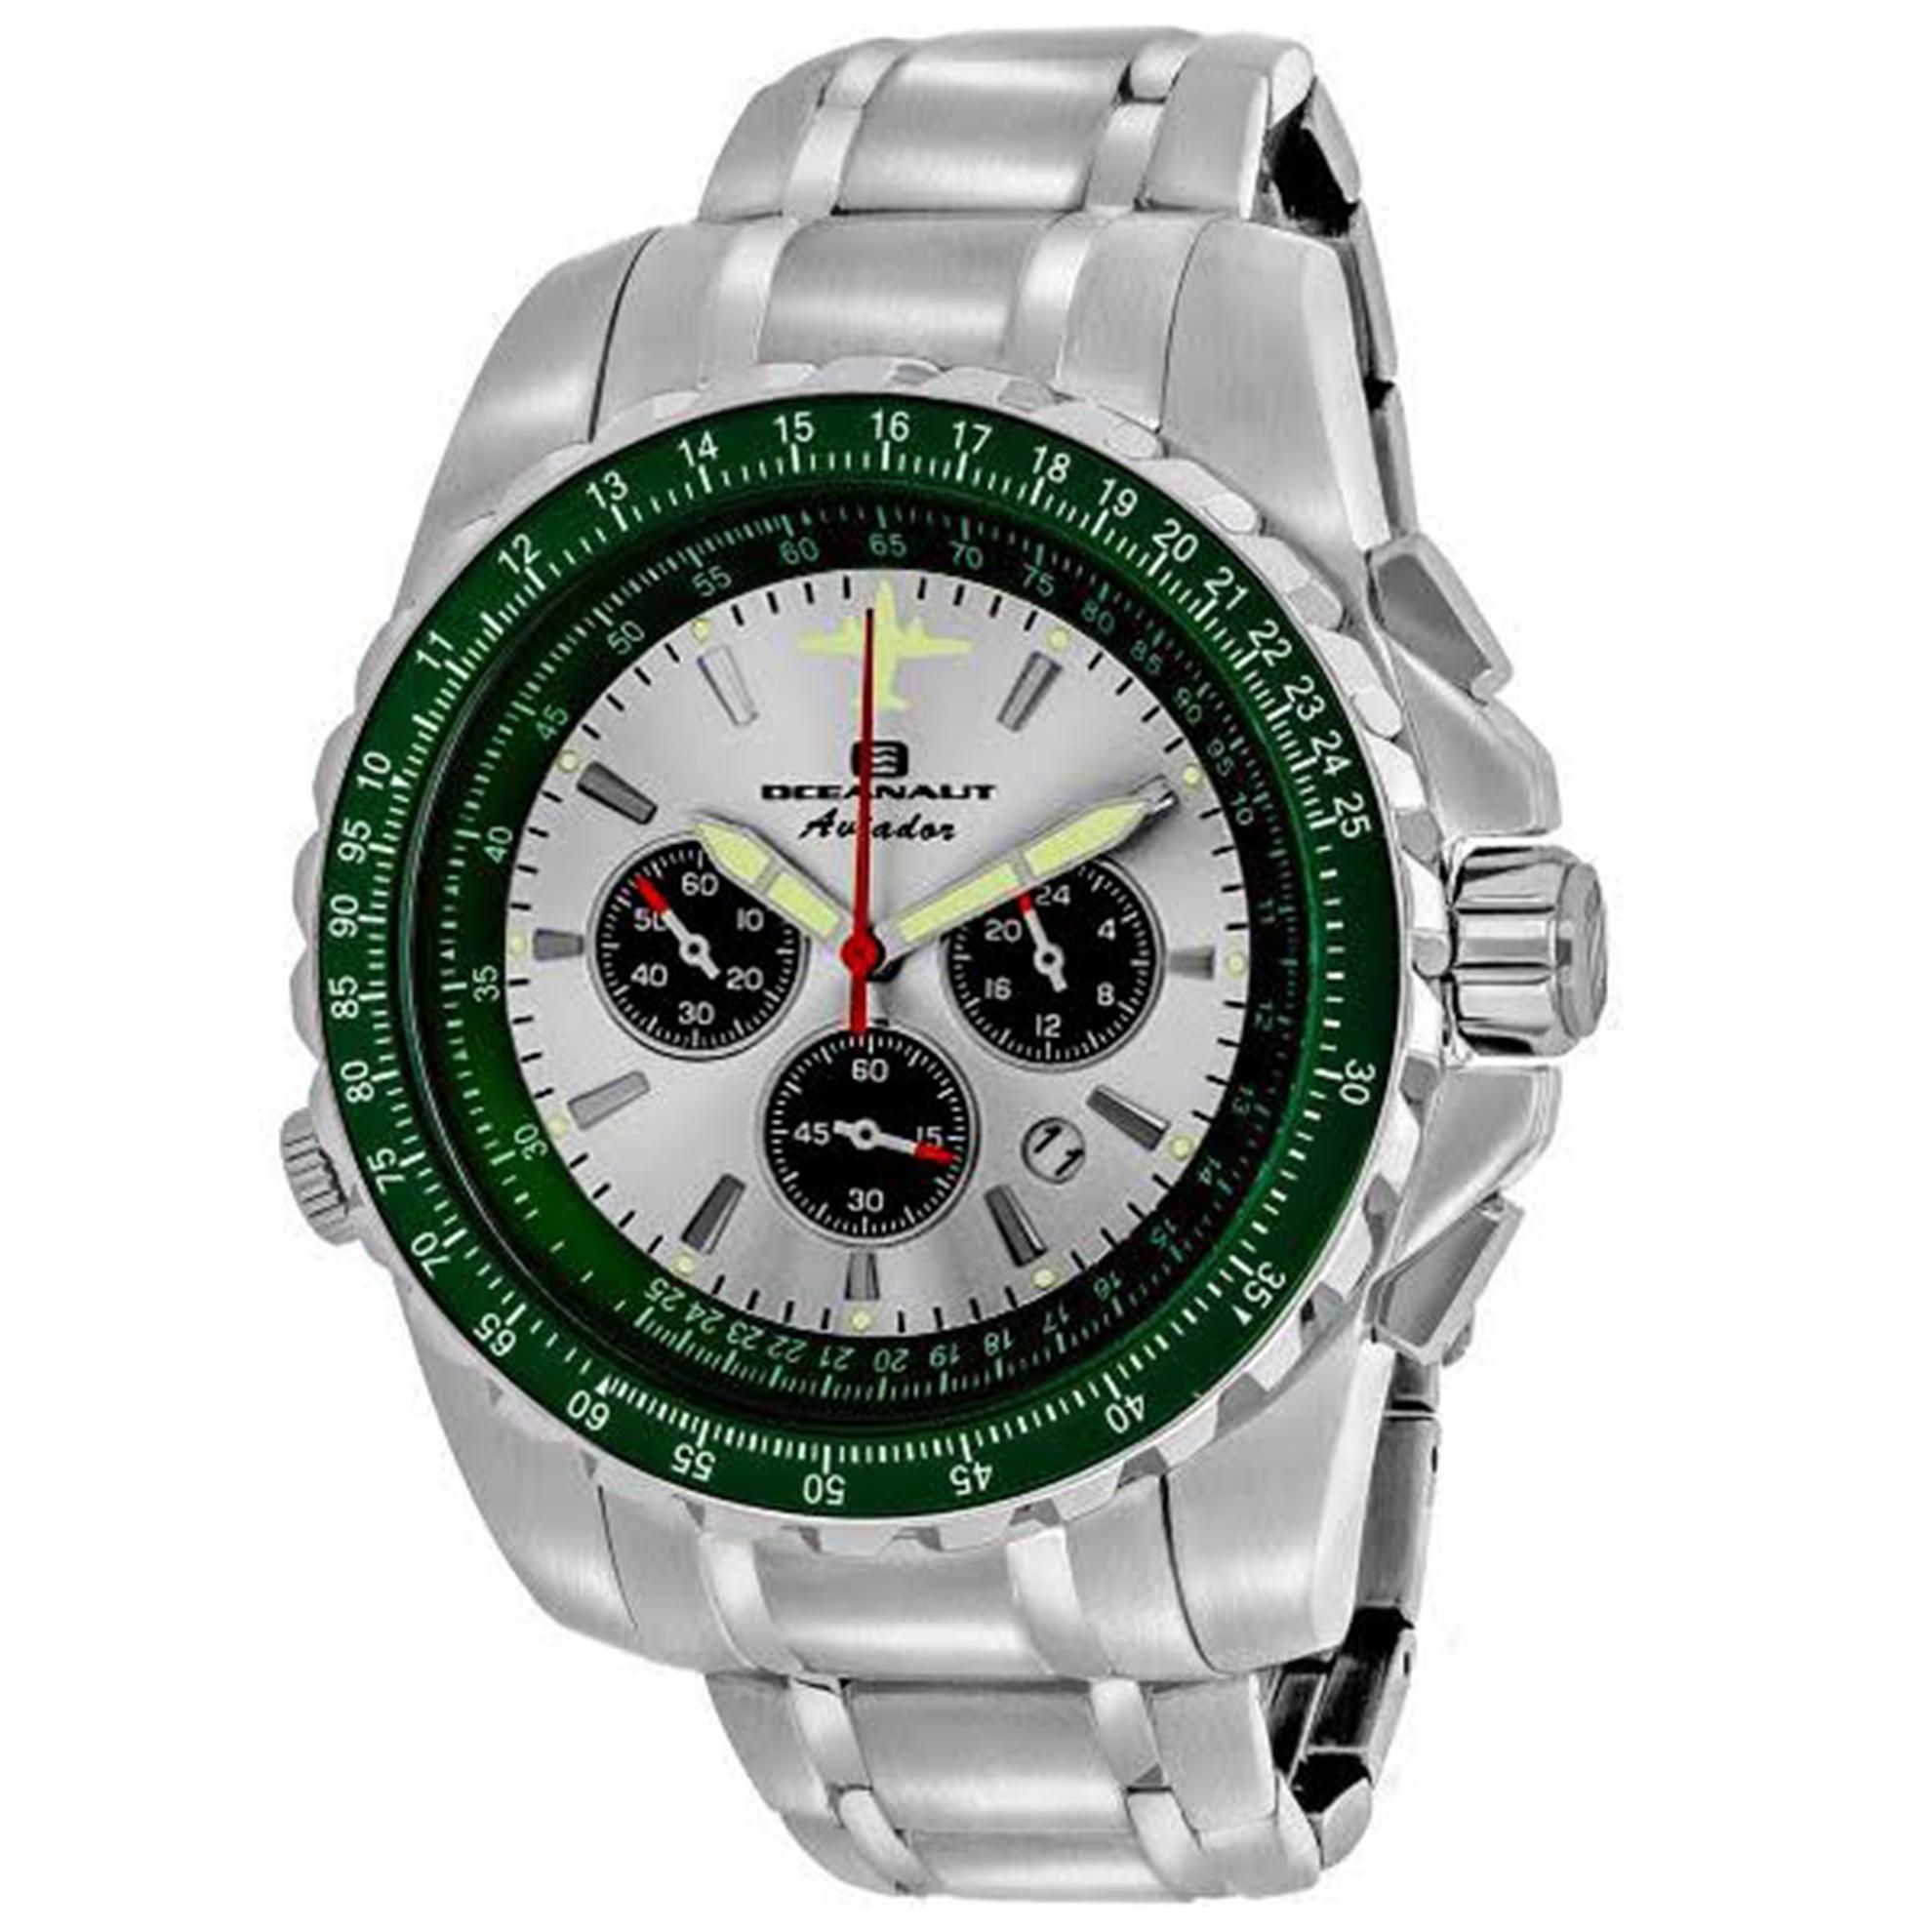 Oceanaut OC0117-SE Oceanaut Special Edition Aviador Chronograph Silver Dial Green Bezel